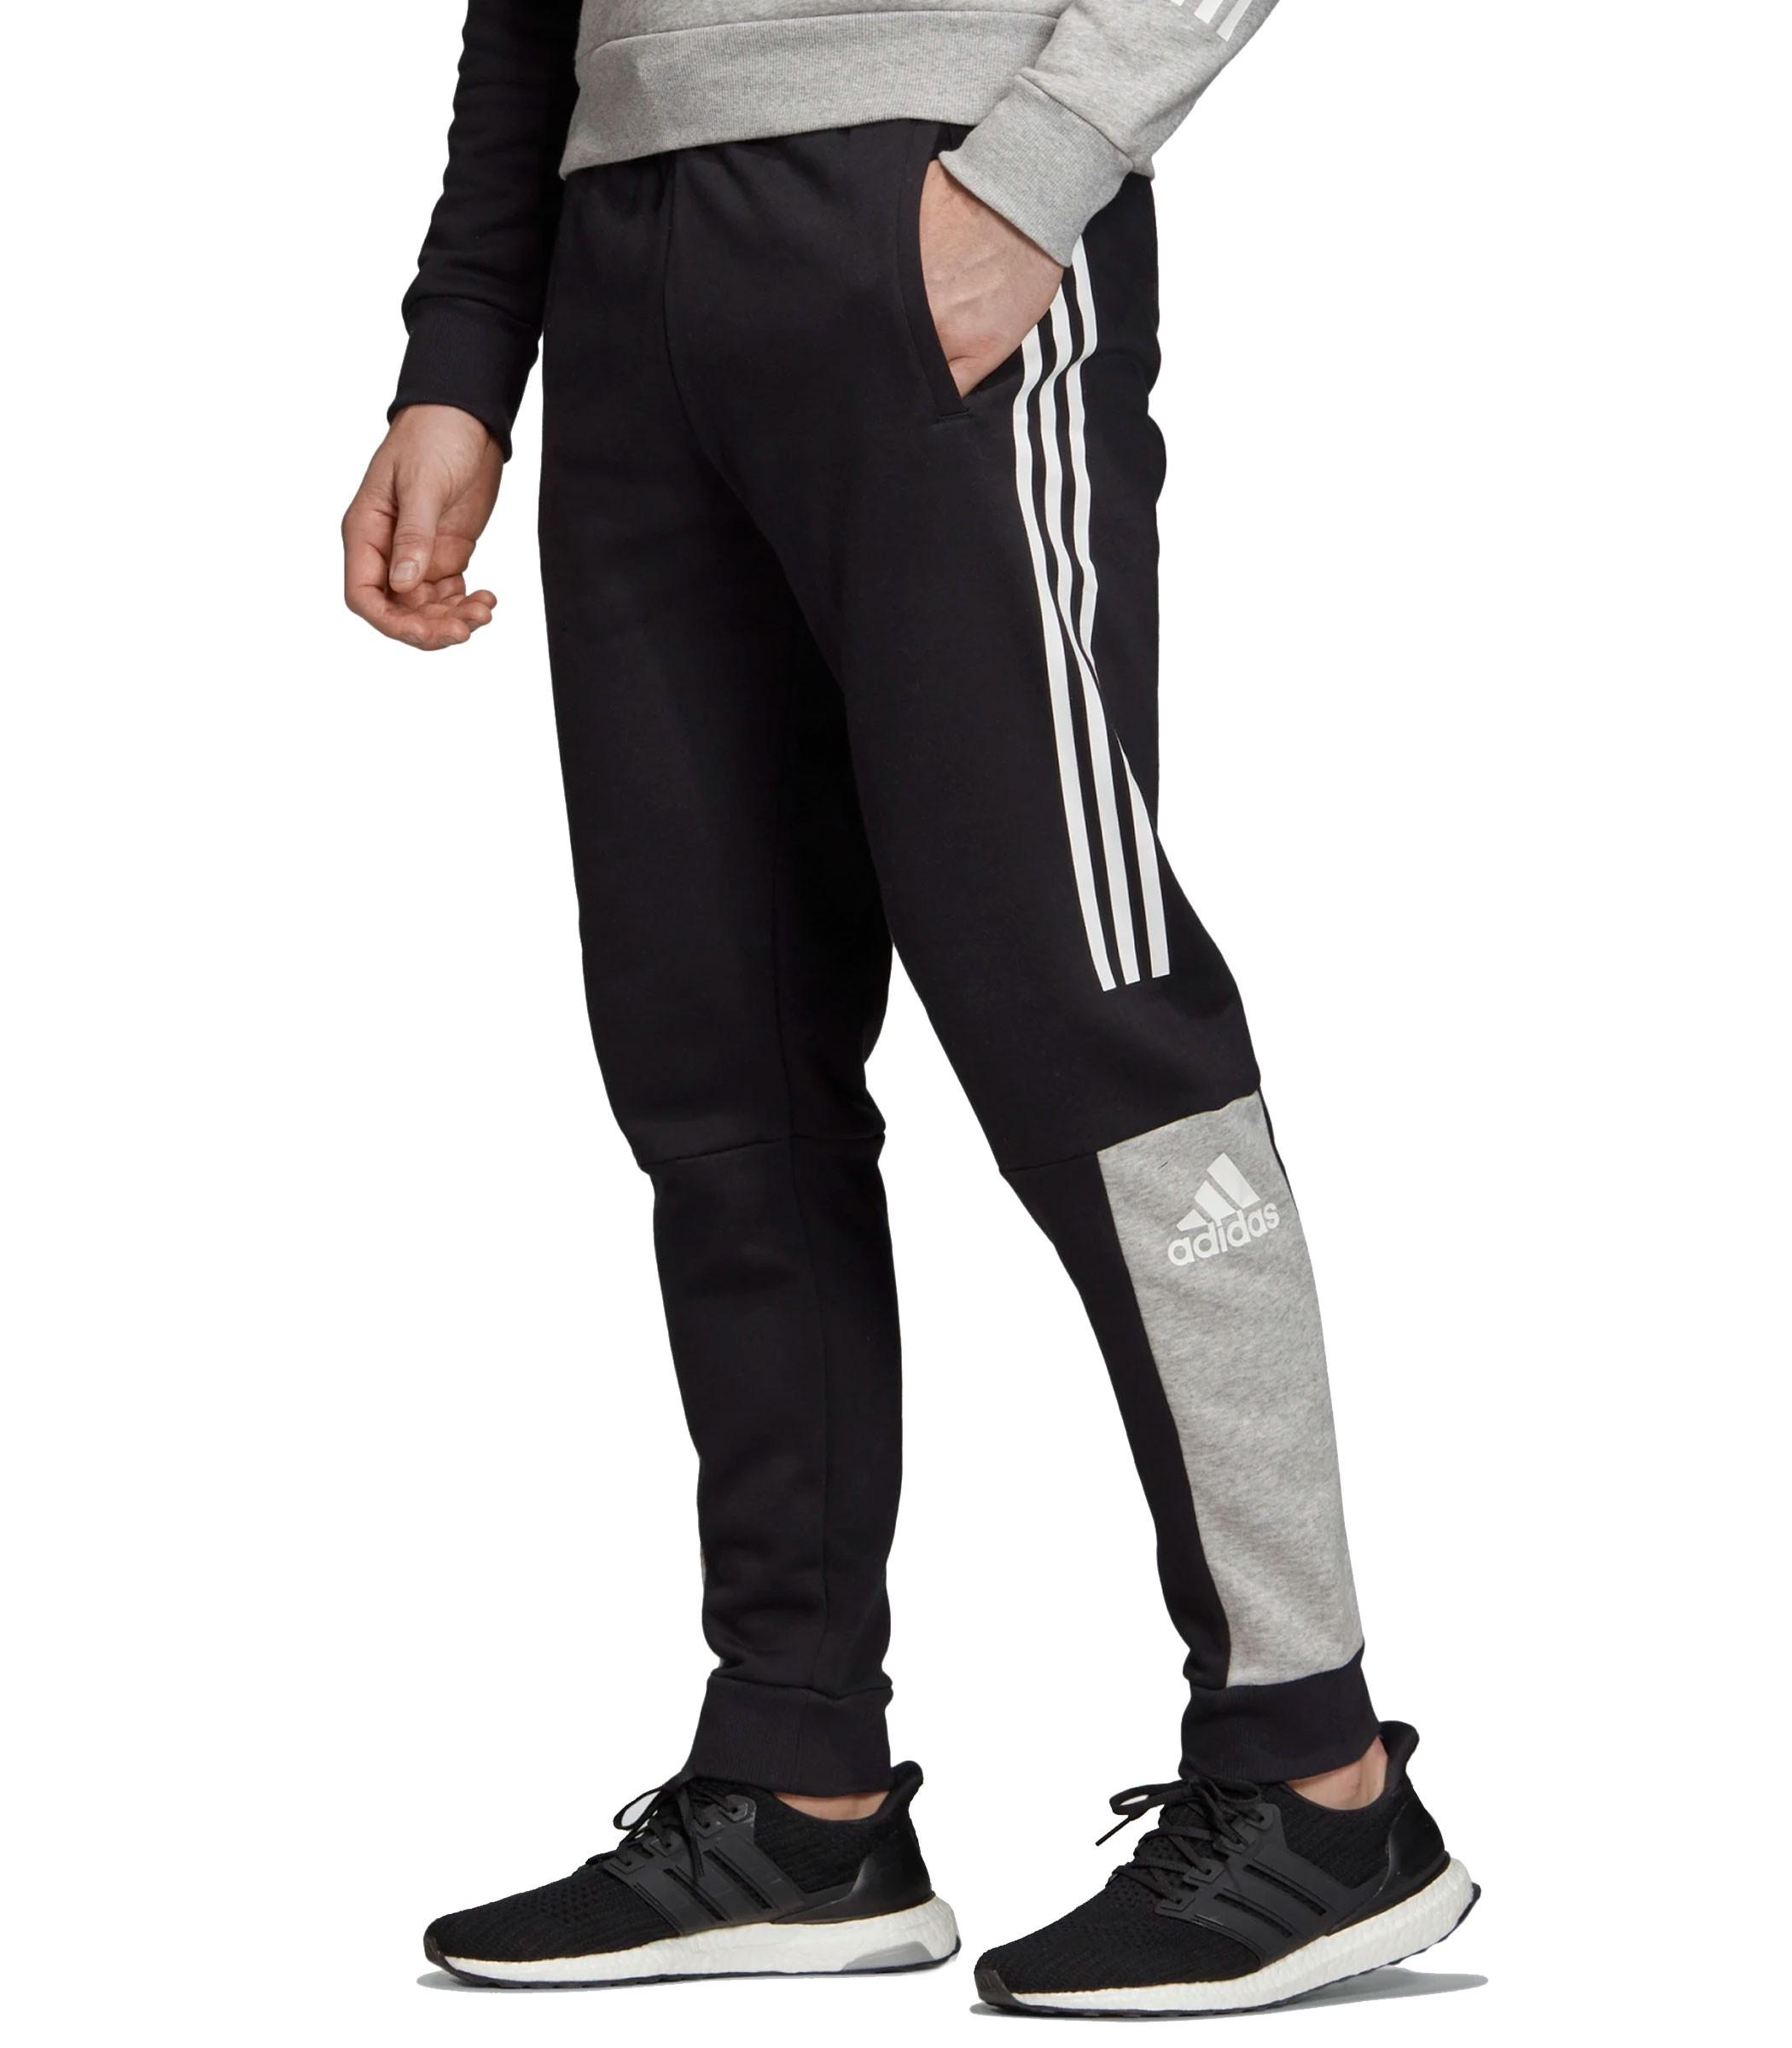 pantaloni tuta adidas uomo